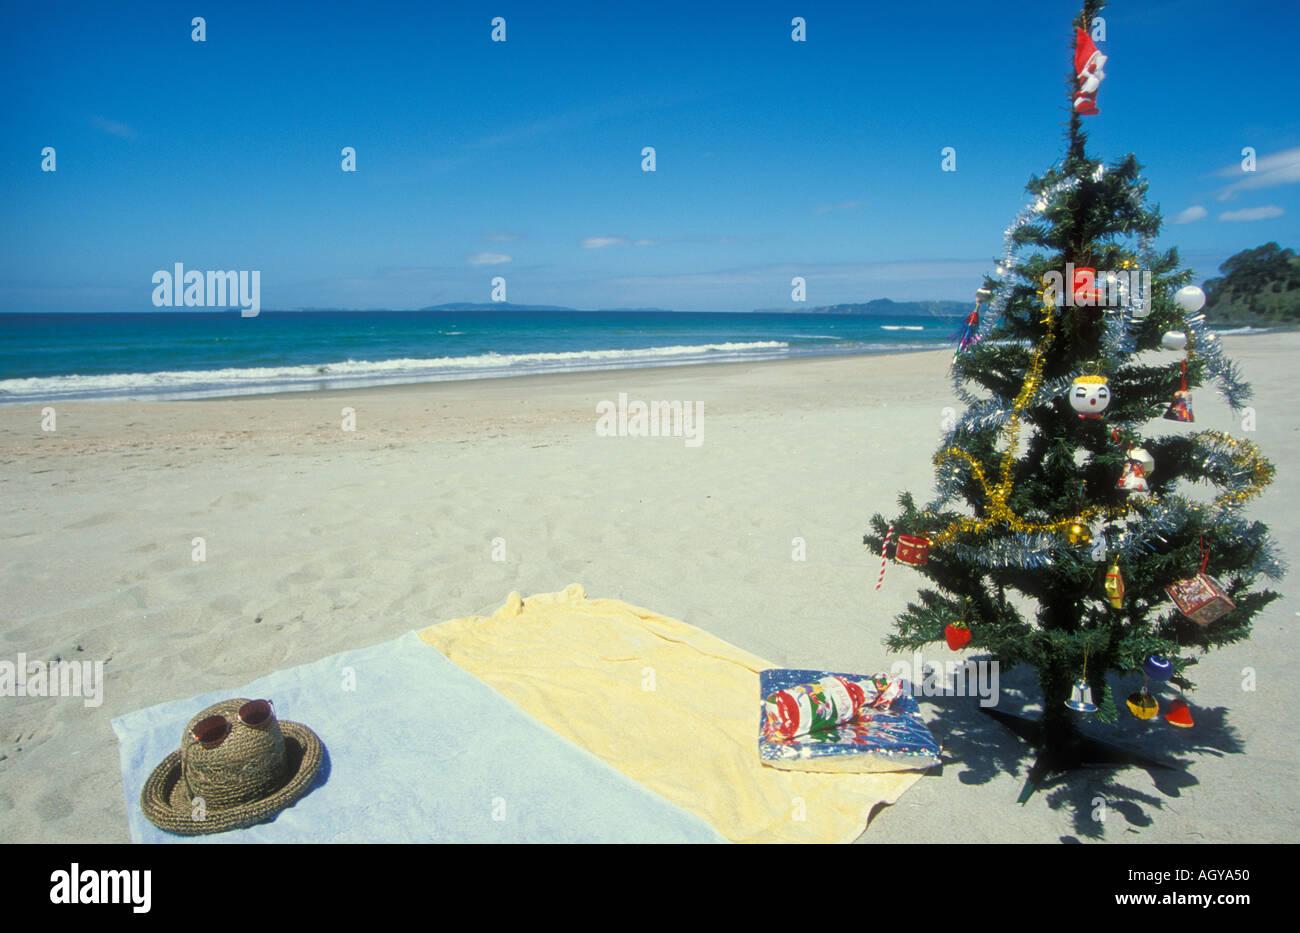 surreal kiwi christmas on the beach coromandel peninsula north island new zealand stock image - Christmas On The Beach